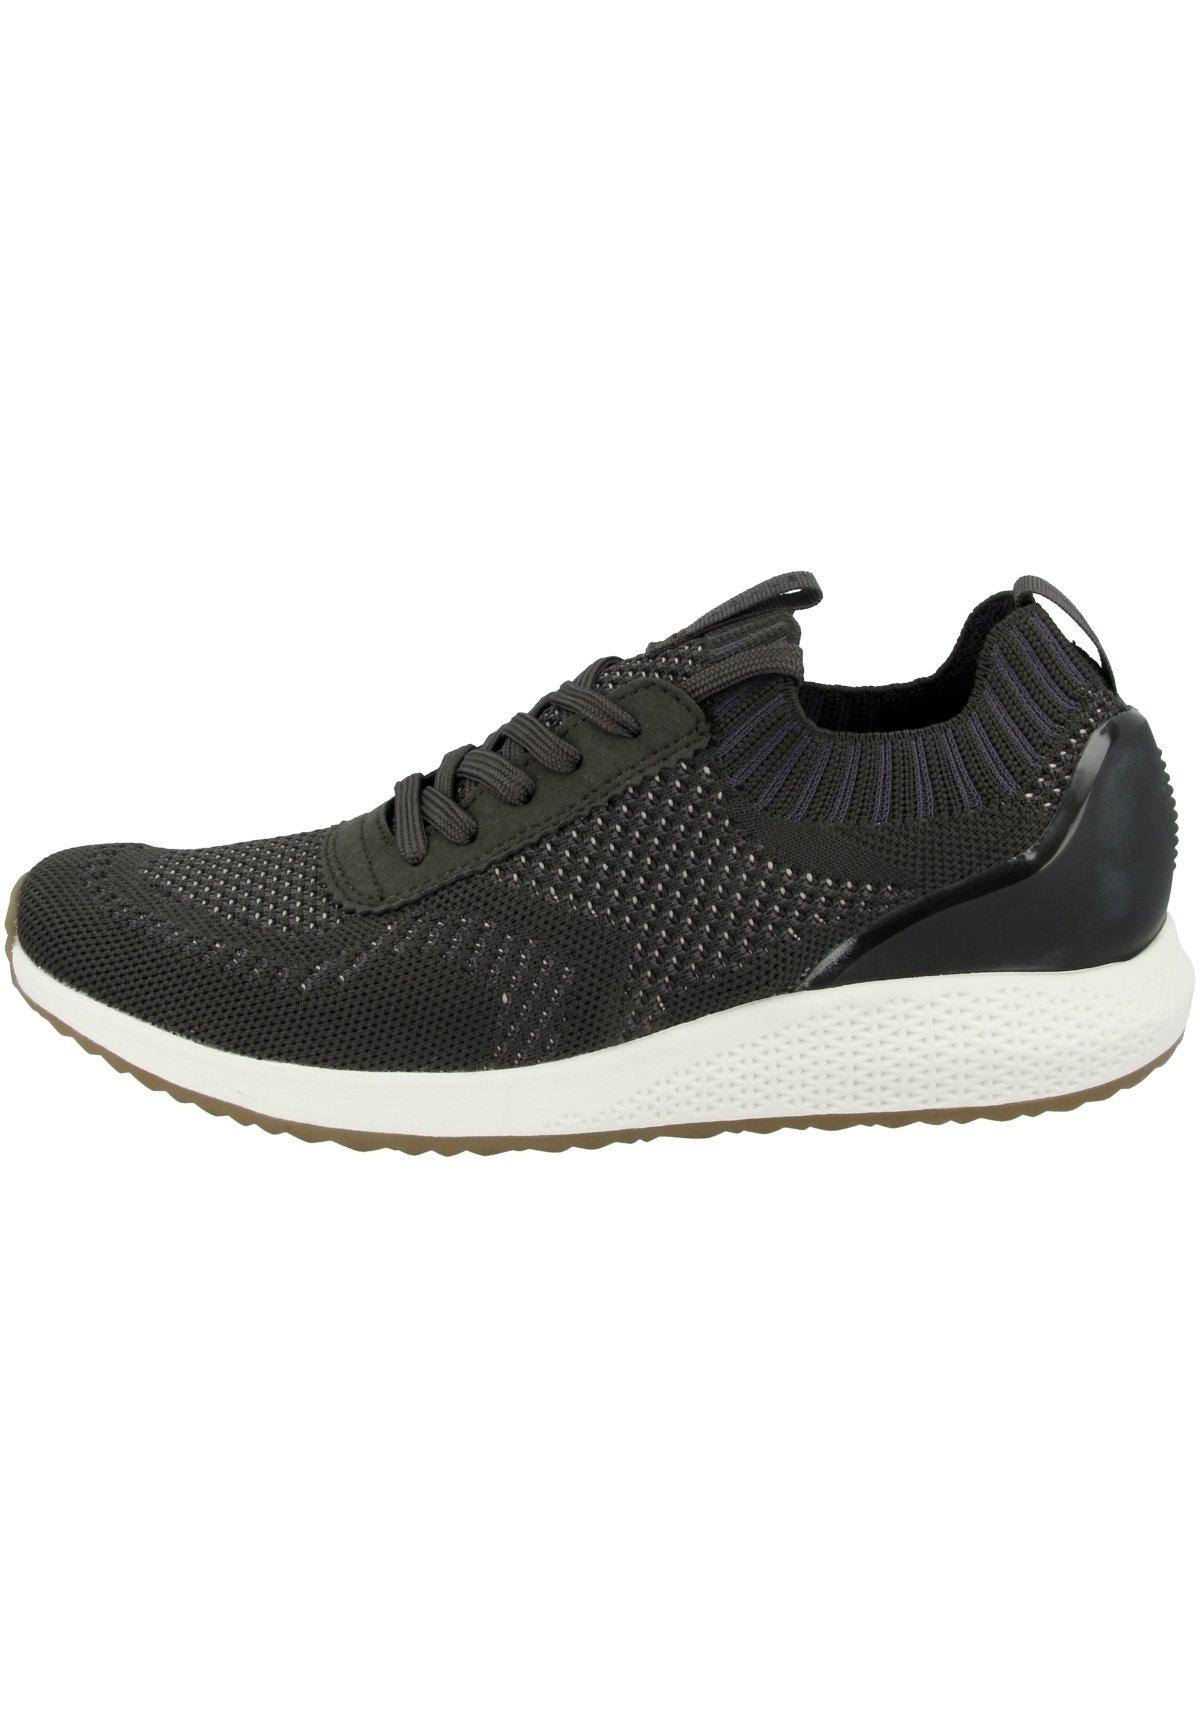 Damen Sneaker low - graphite